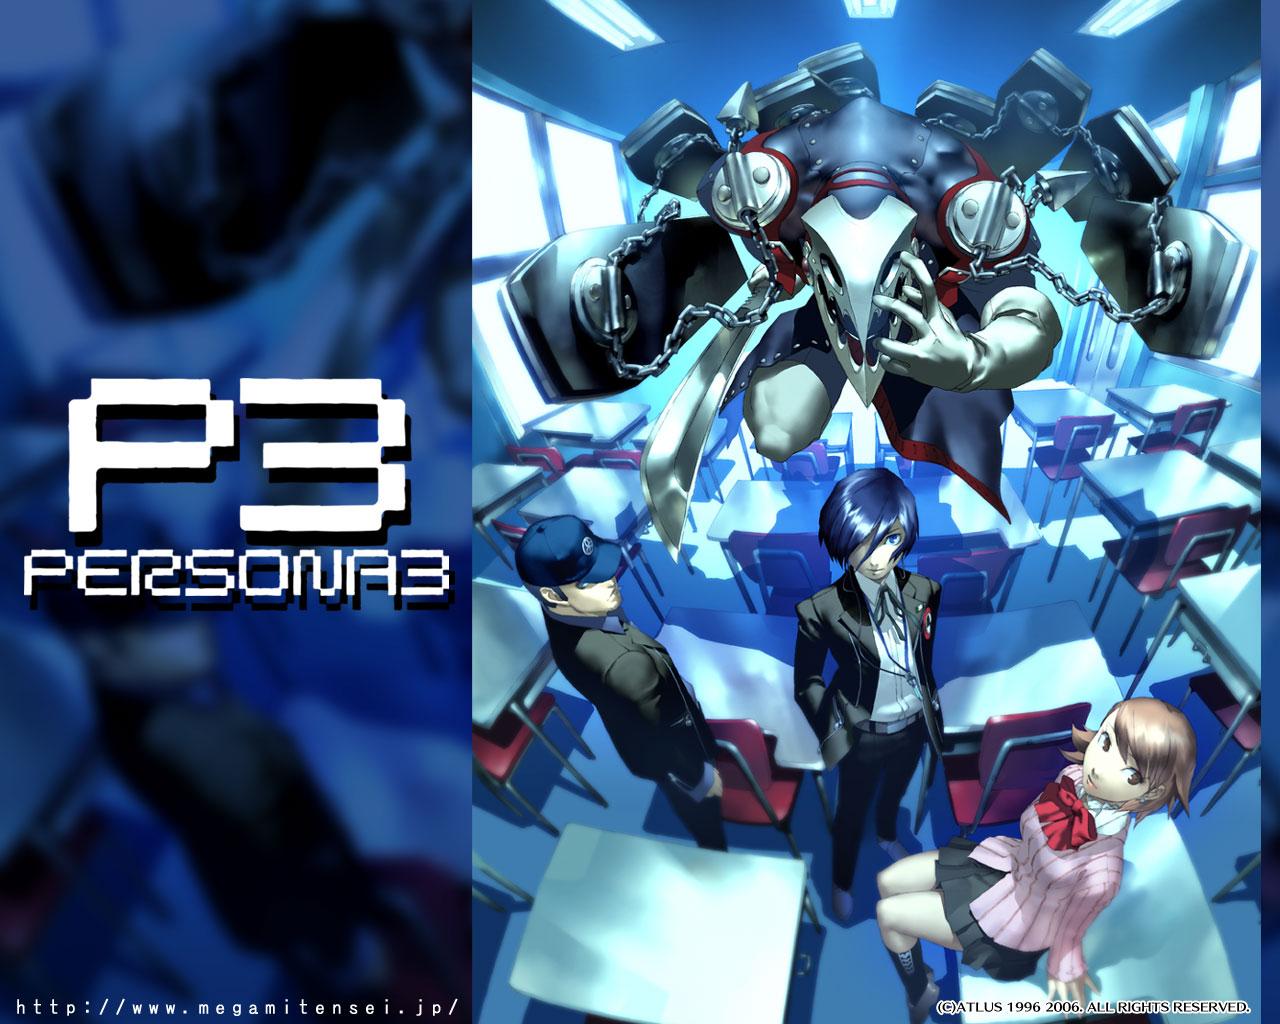 Wallpaper Shin Megami Tensei Shin Megami Tensei Persona 3 Games